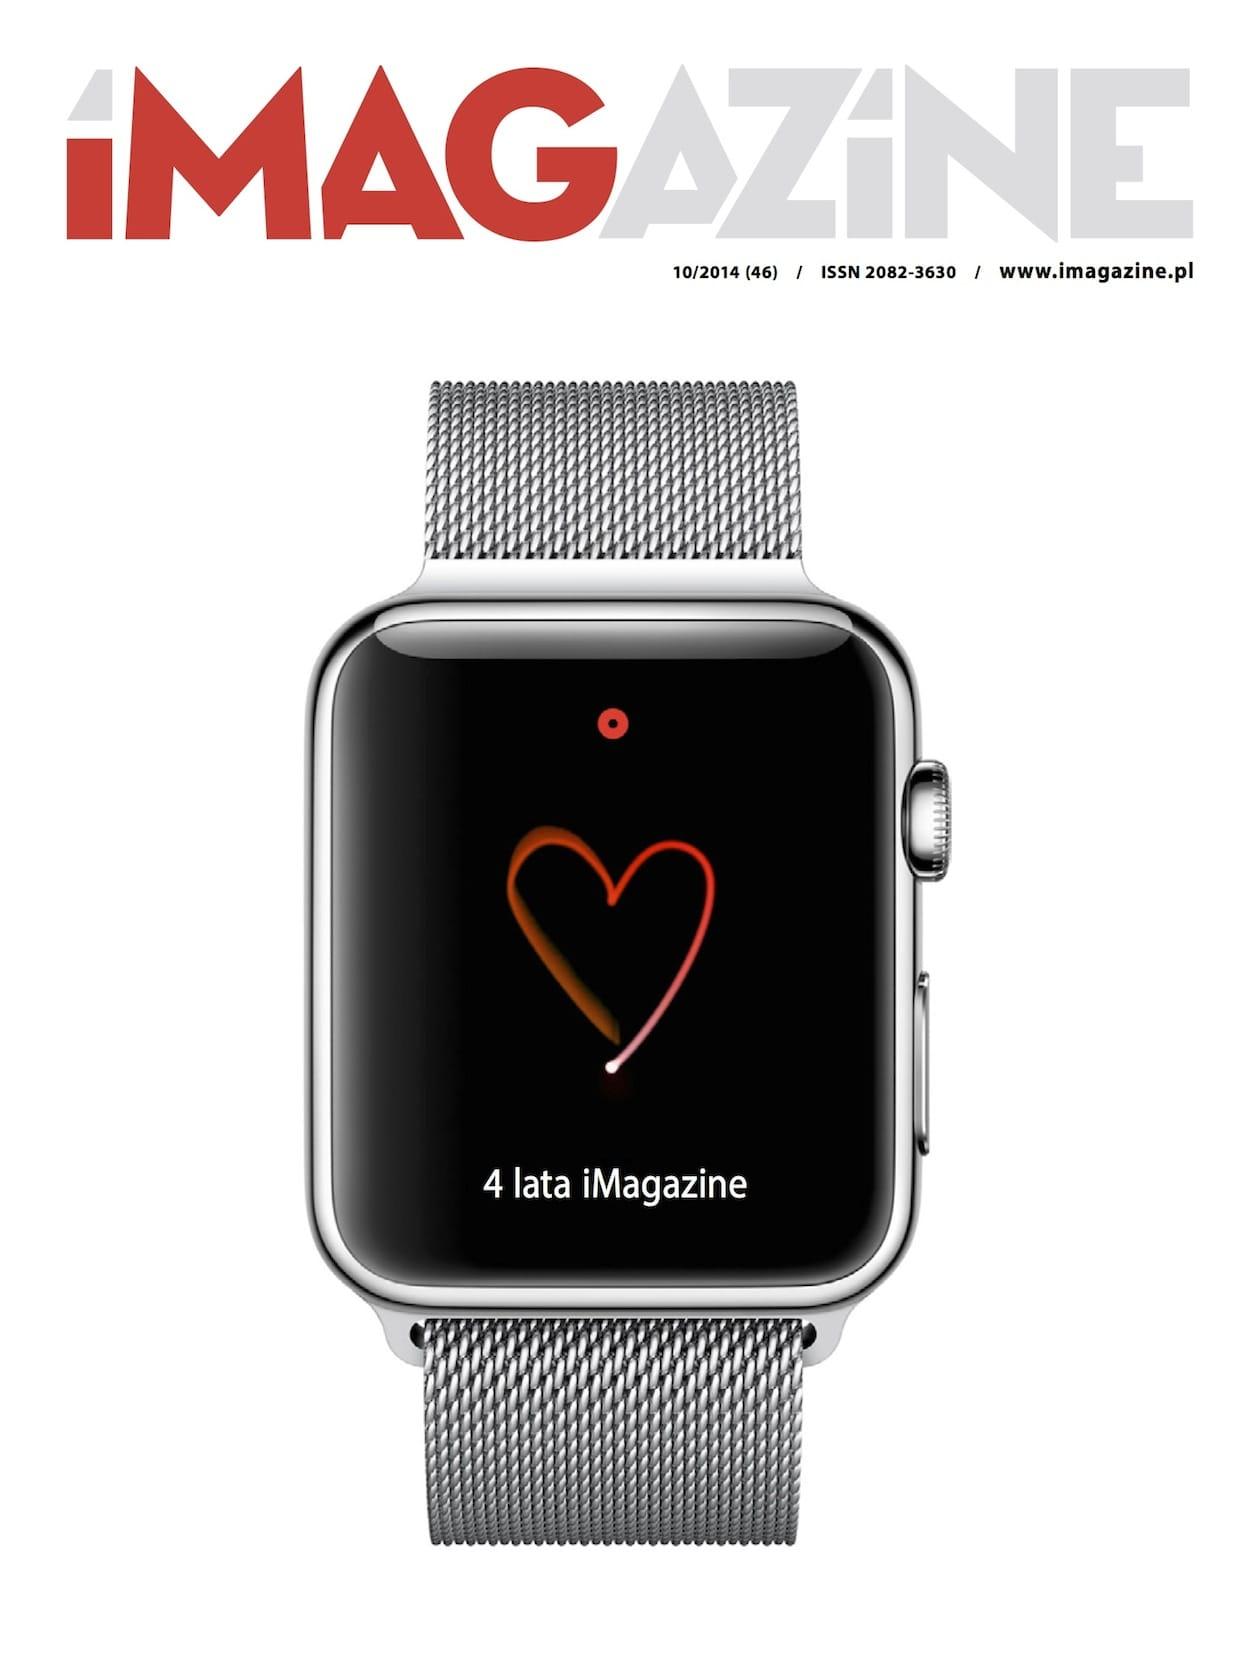 iMagazine 10/2014 – iPhone 6 i 4-te urodziny iMagazine